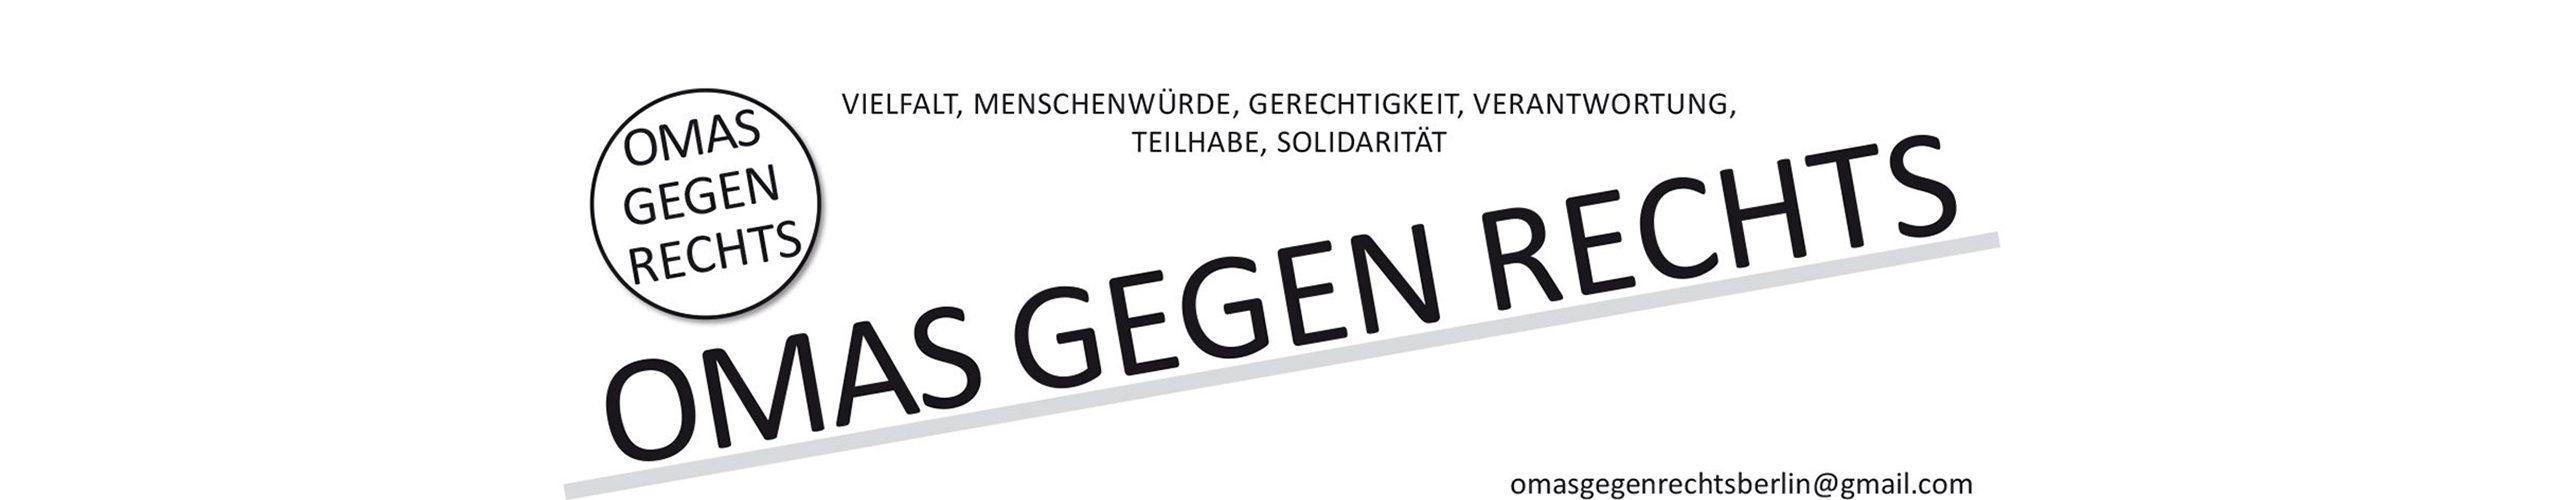 OMAS GEGEN RECHTS BERLIN  /  Deutschland-Bündnis